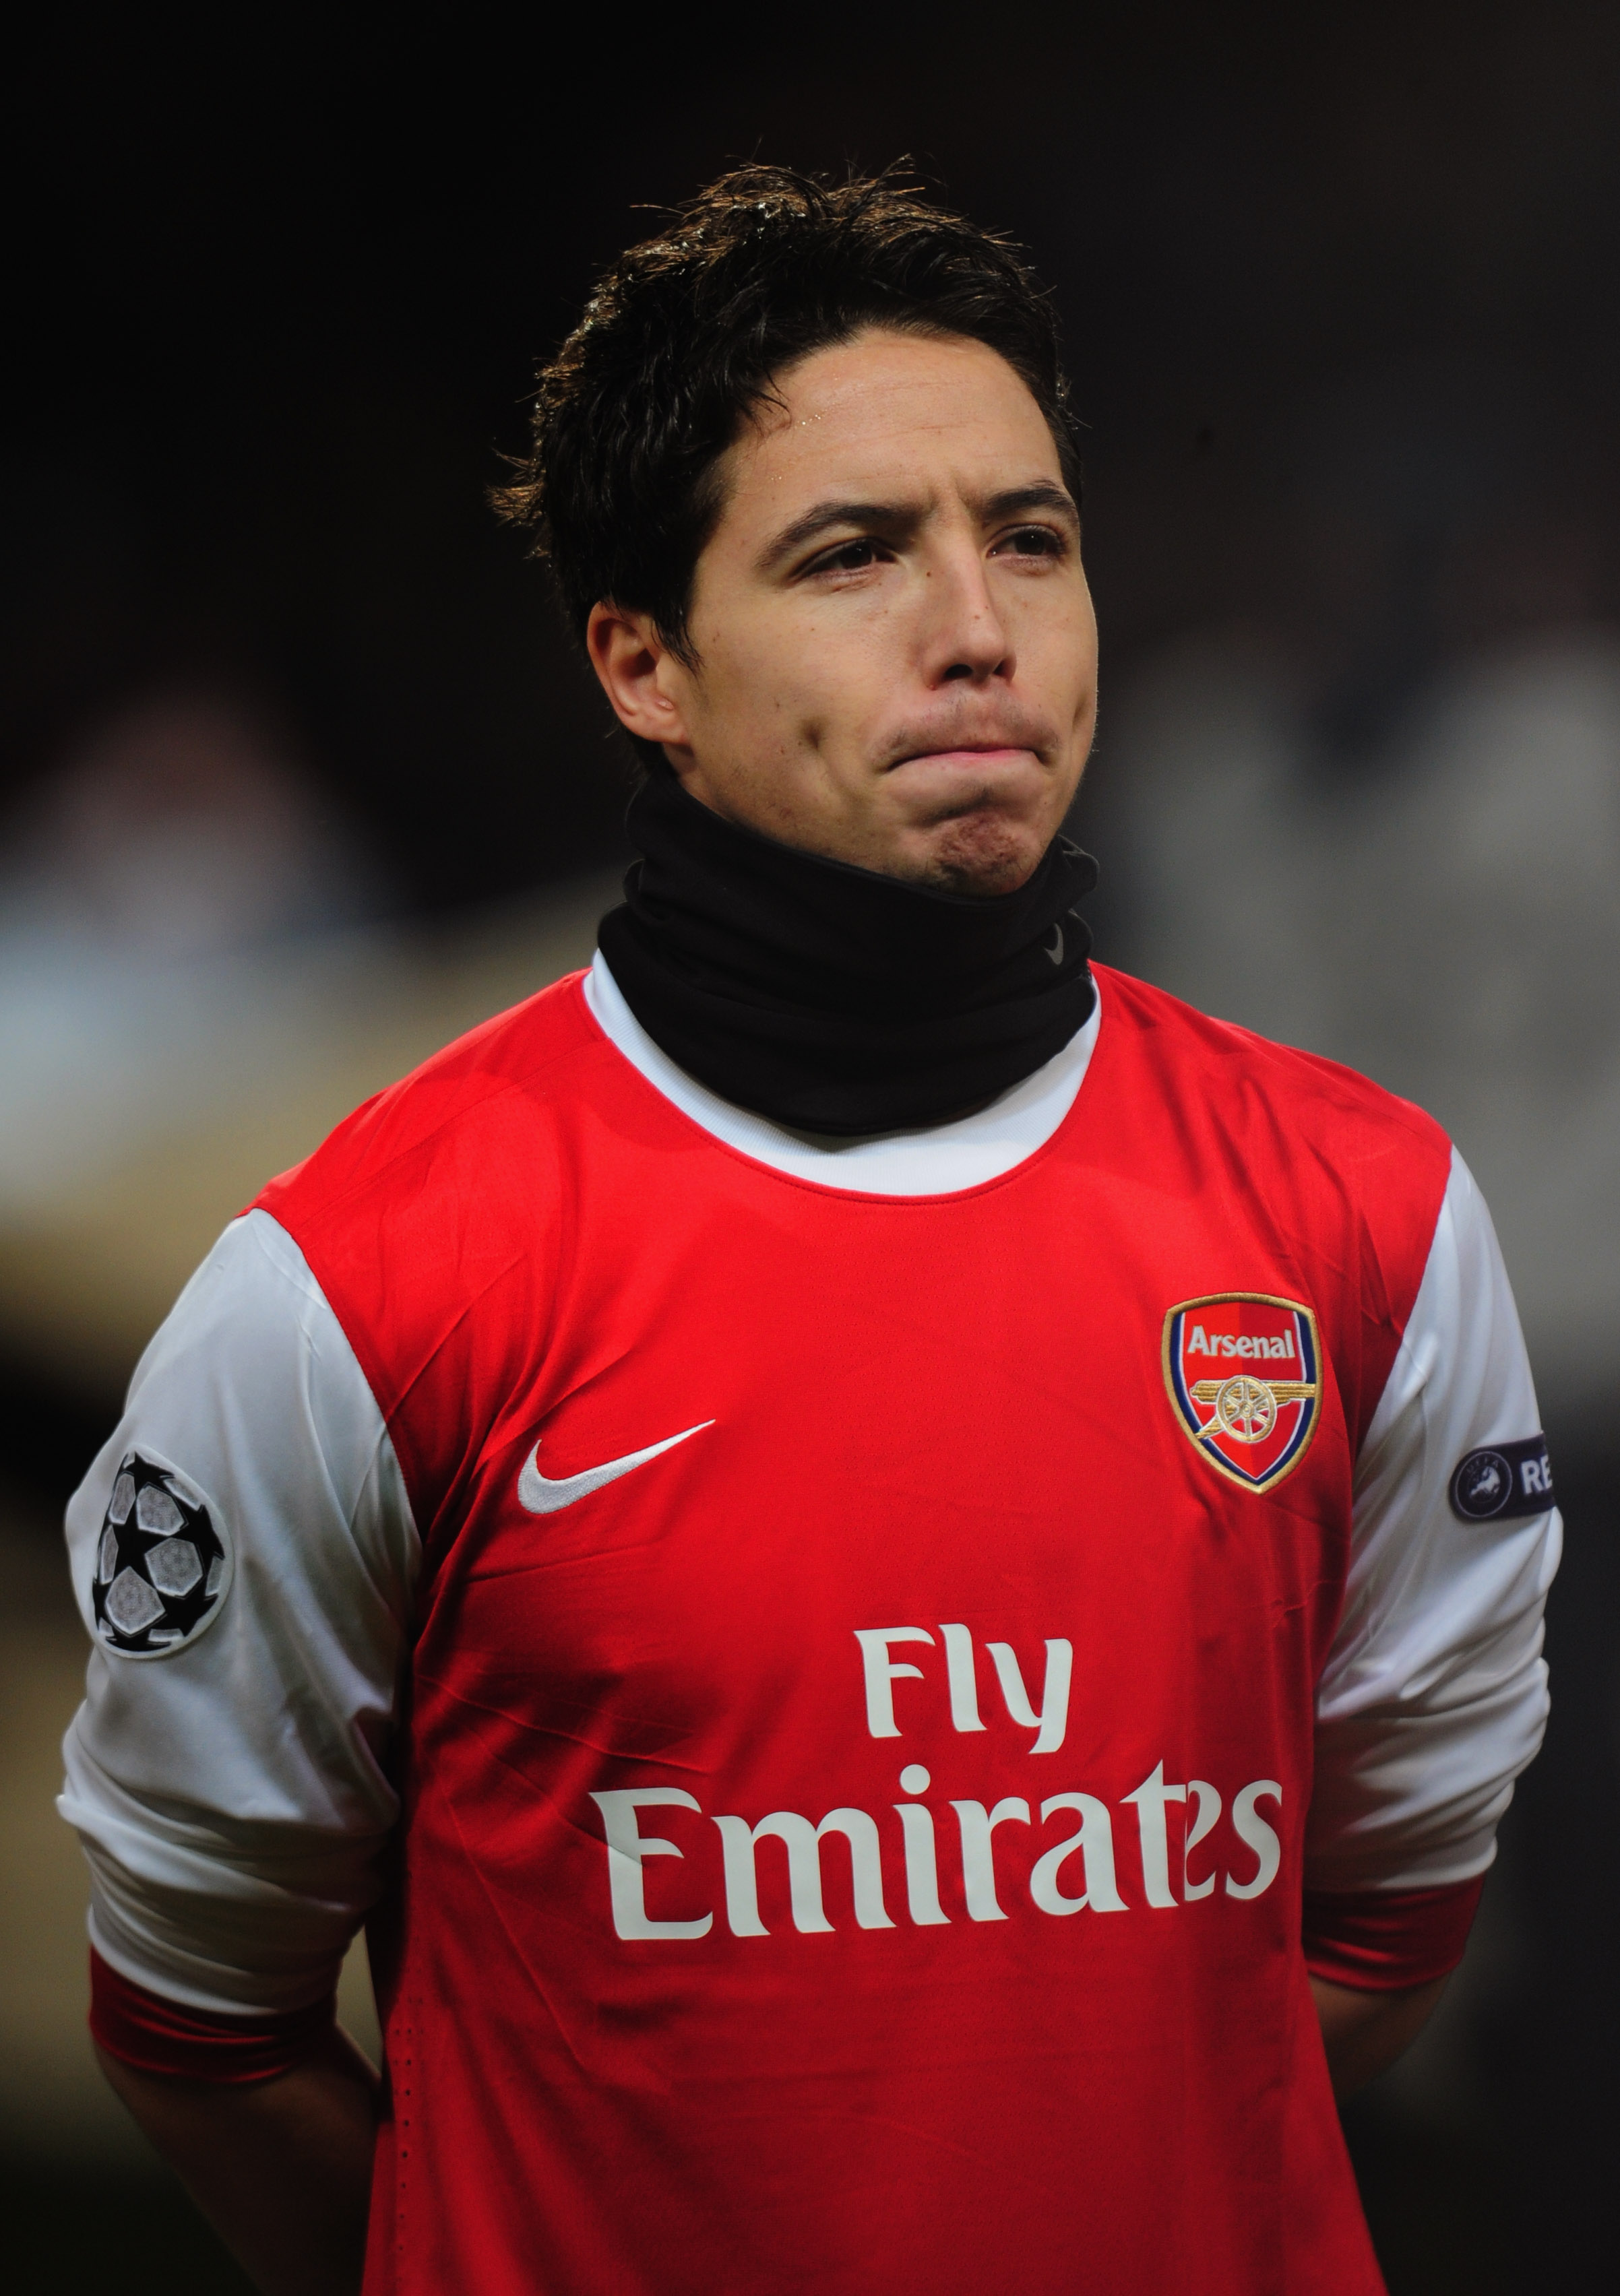 Arsenal Awards 2010: Nasri Bags Best Goal, Player ...